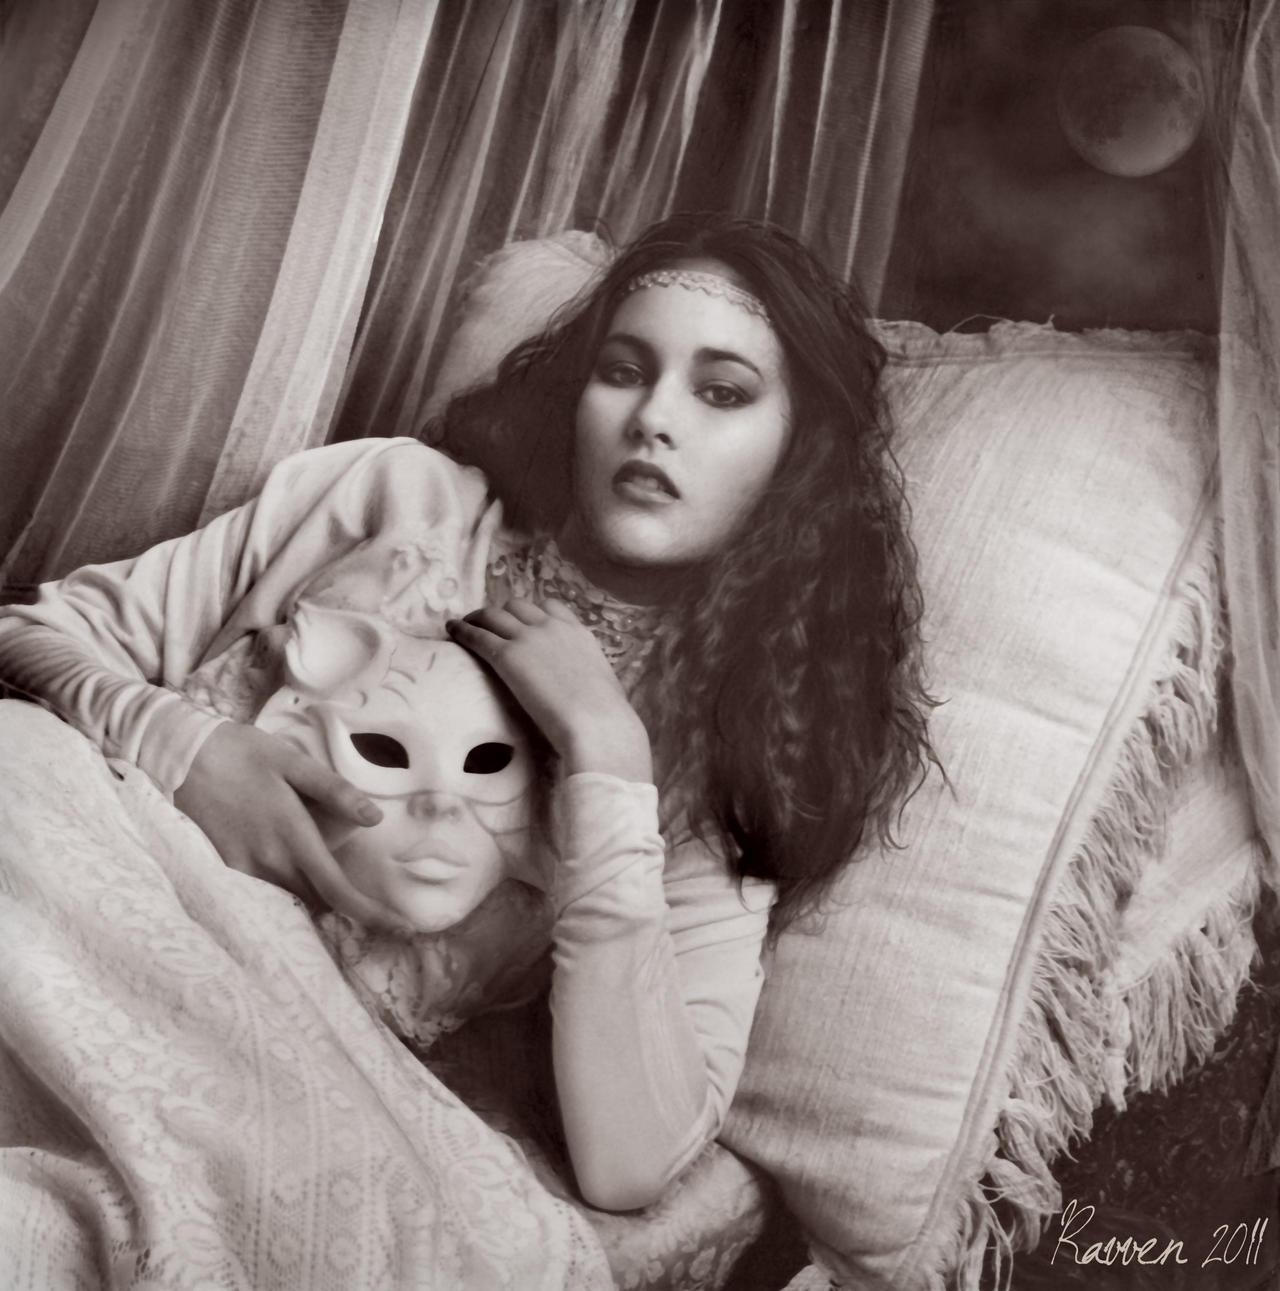 Mask by Ravven78